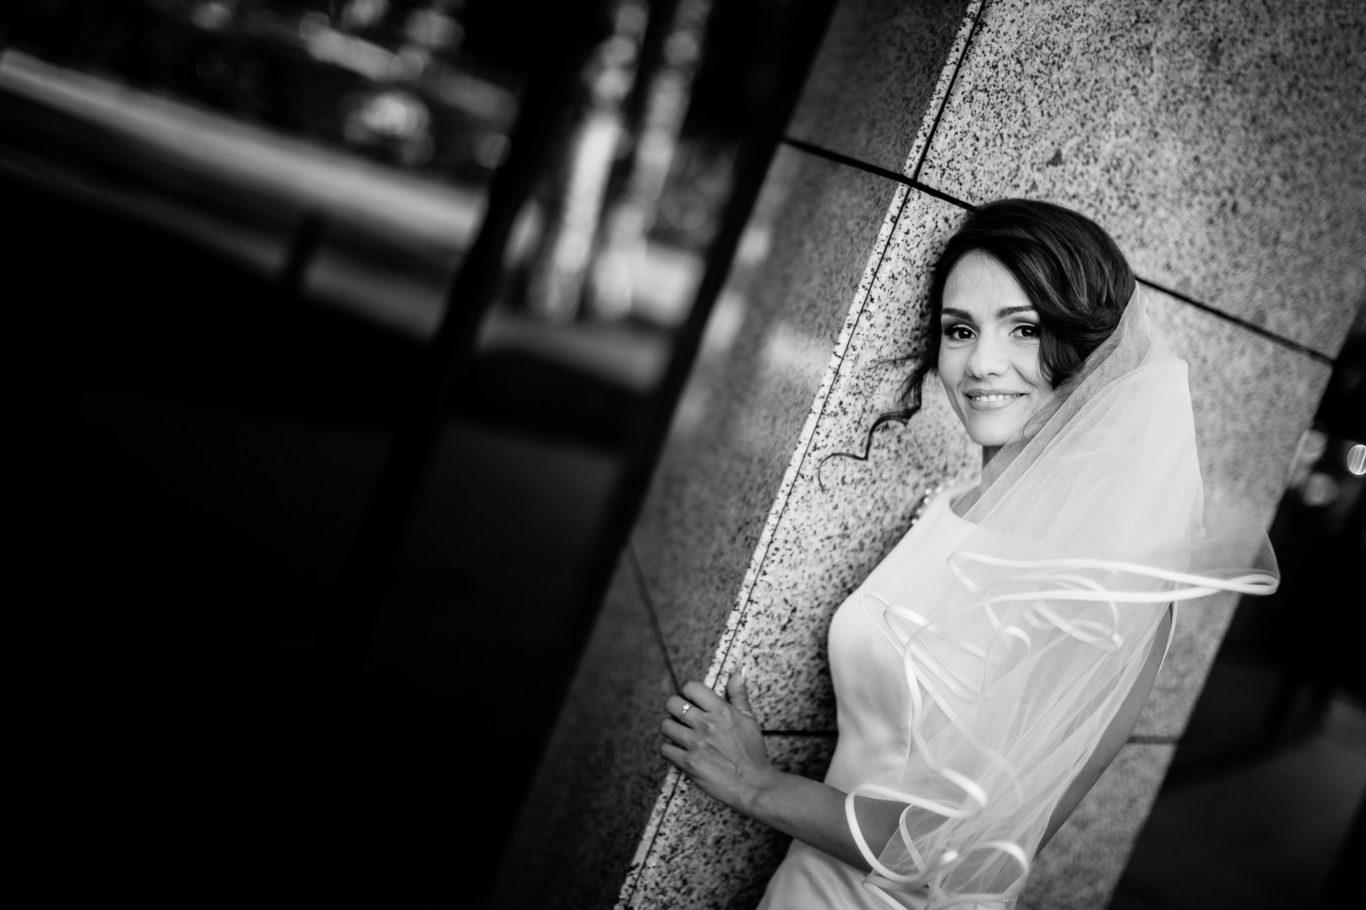 0336-fotografie-nunta-bucuresti-dana-radu-fotograf-ciprian-dumitrescu-cd2_7072